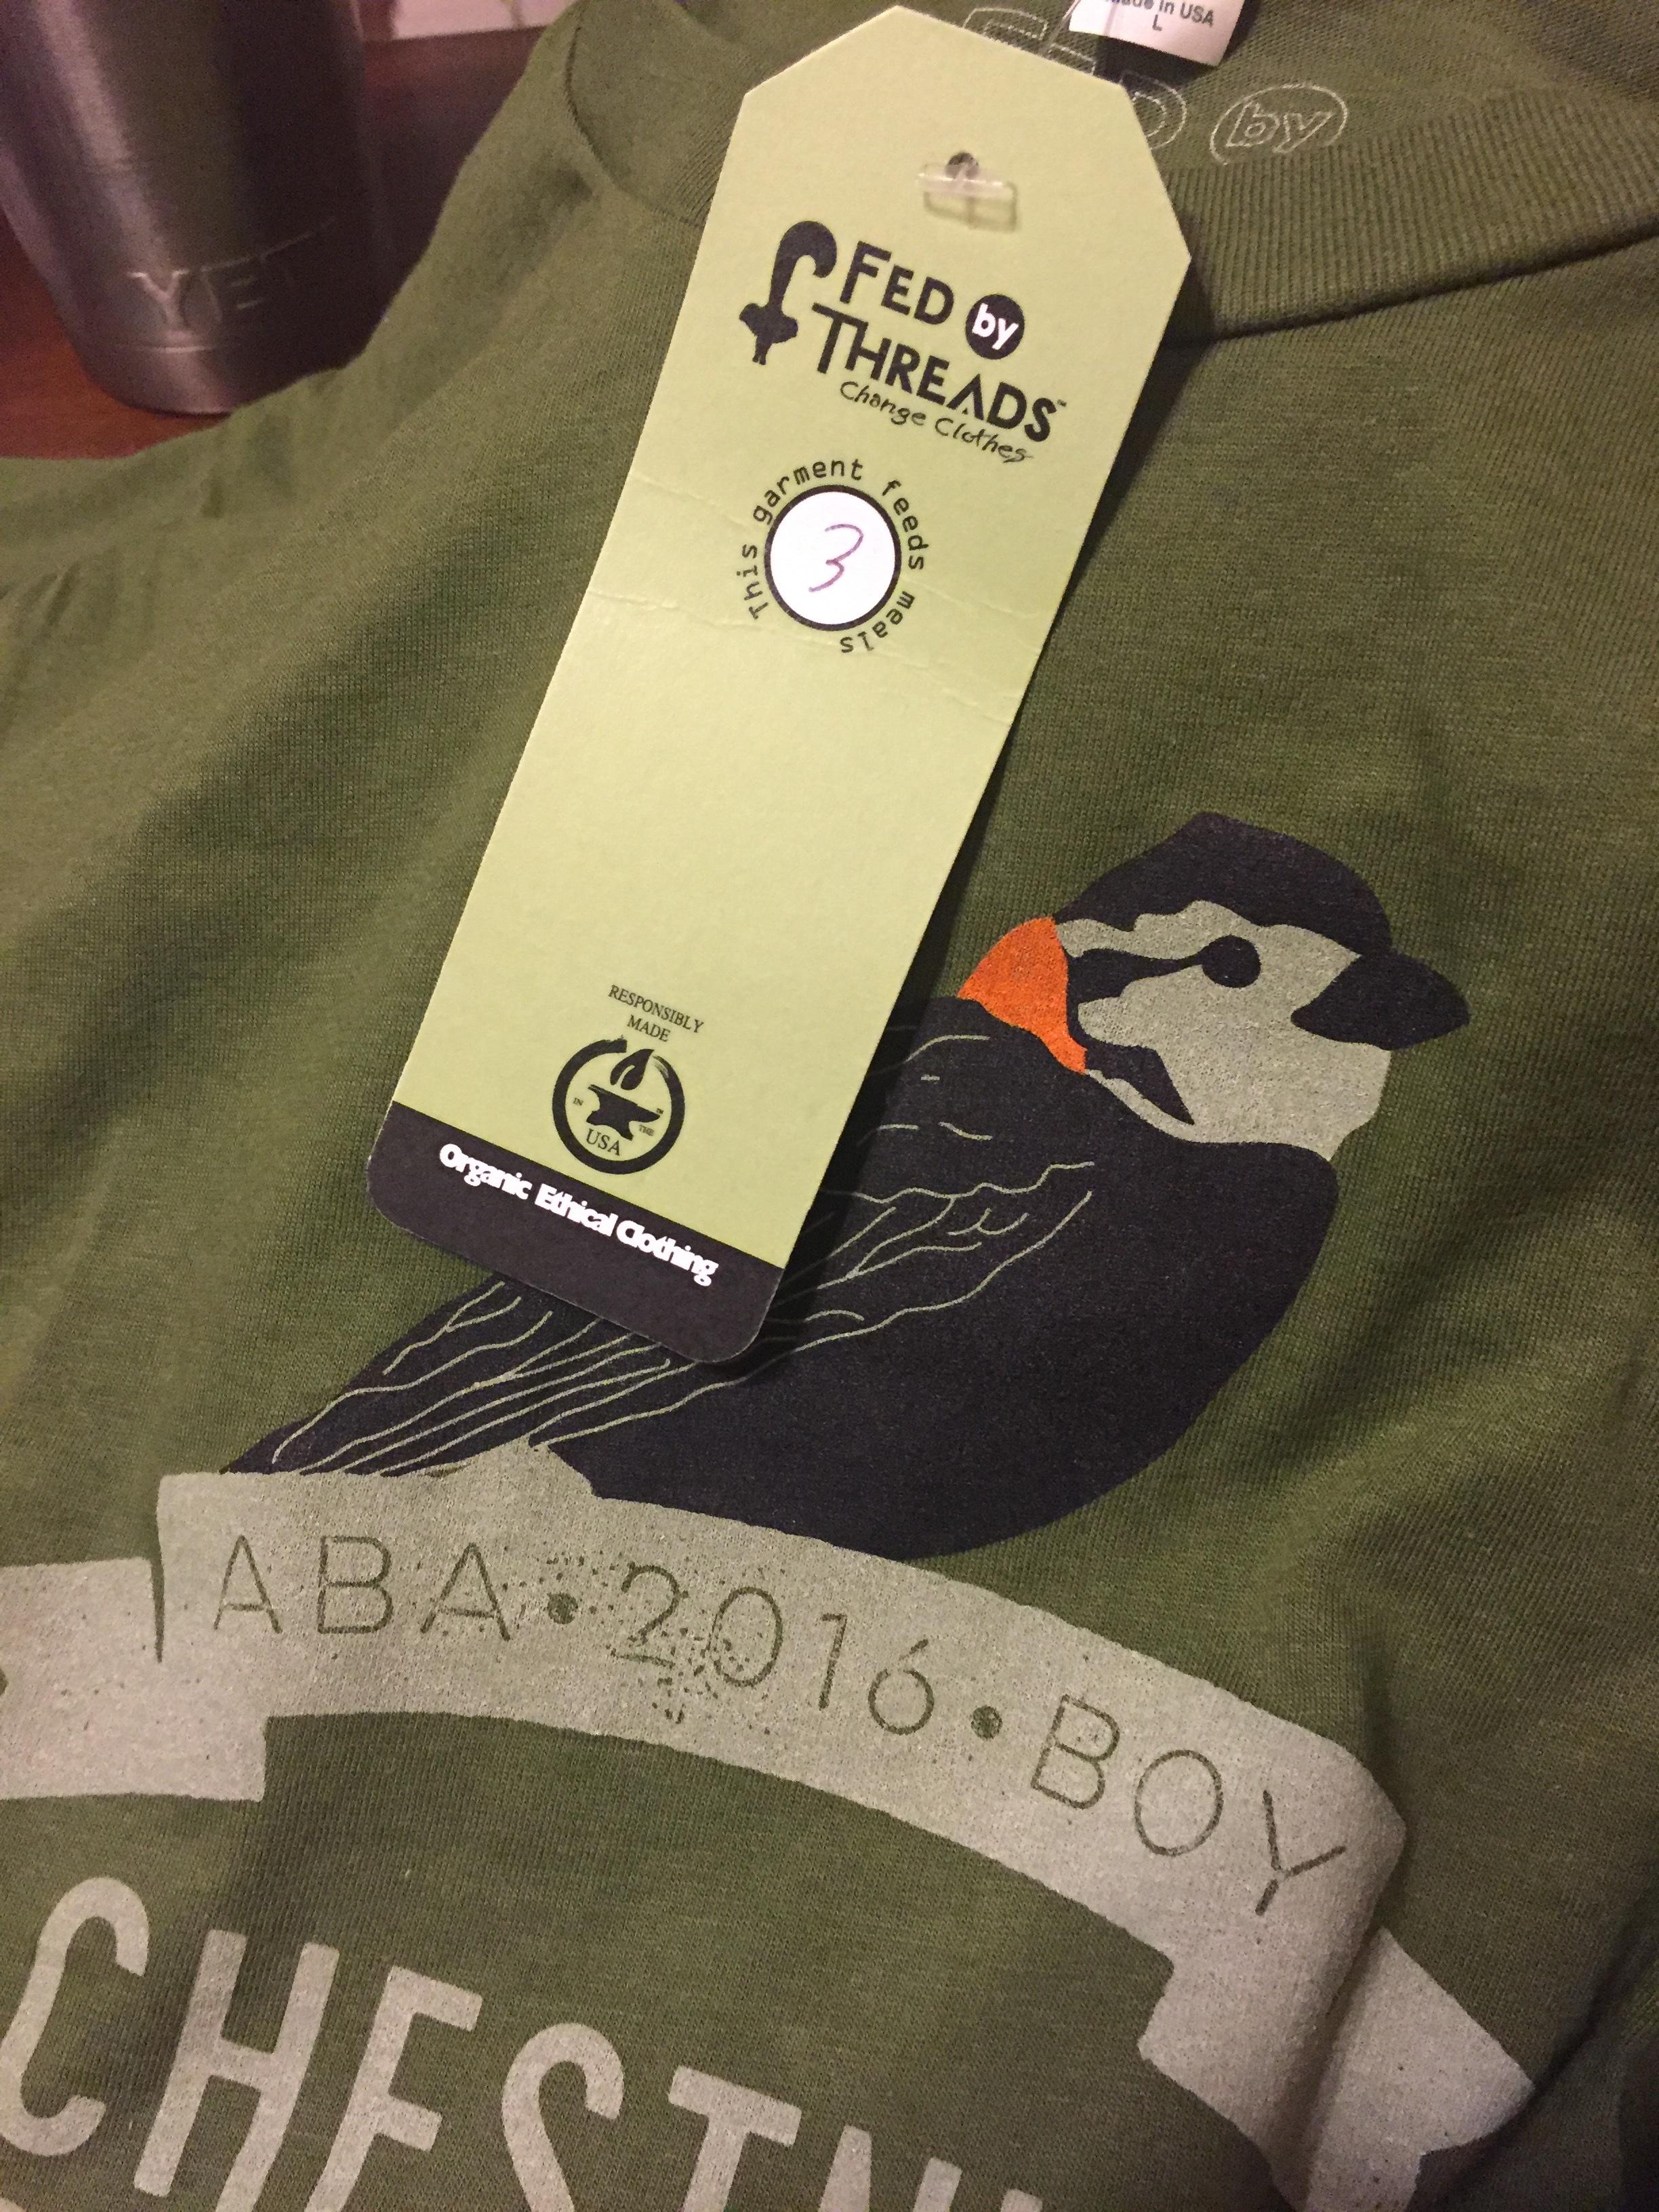 The 2016 ABA Bird of Year shirt!